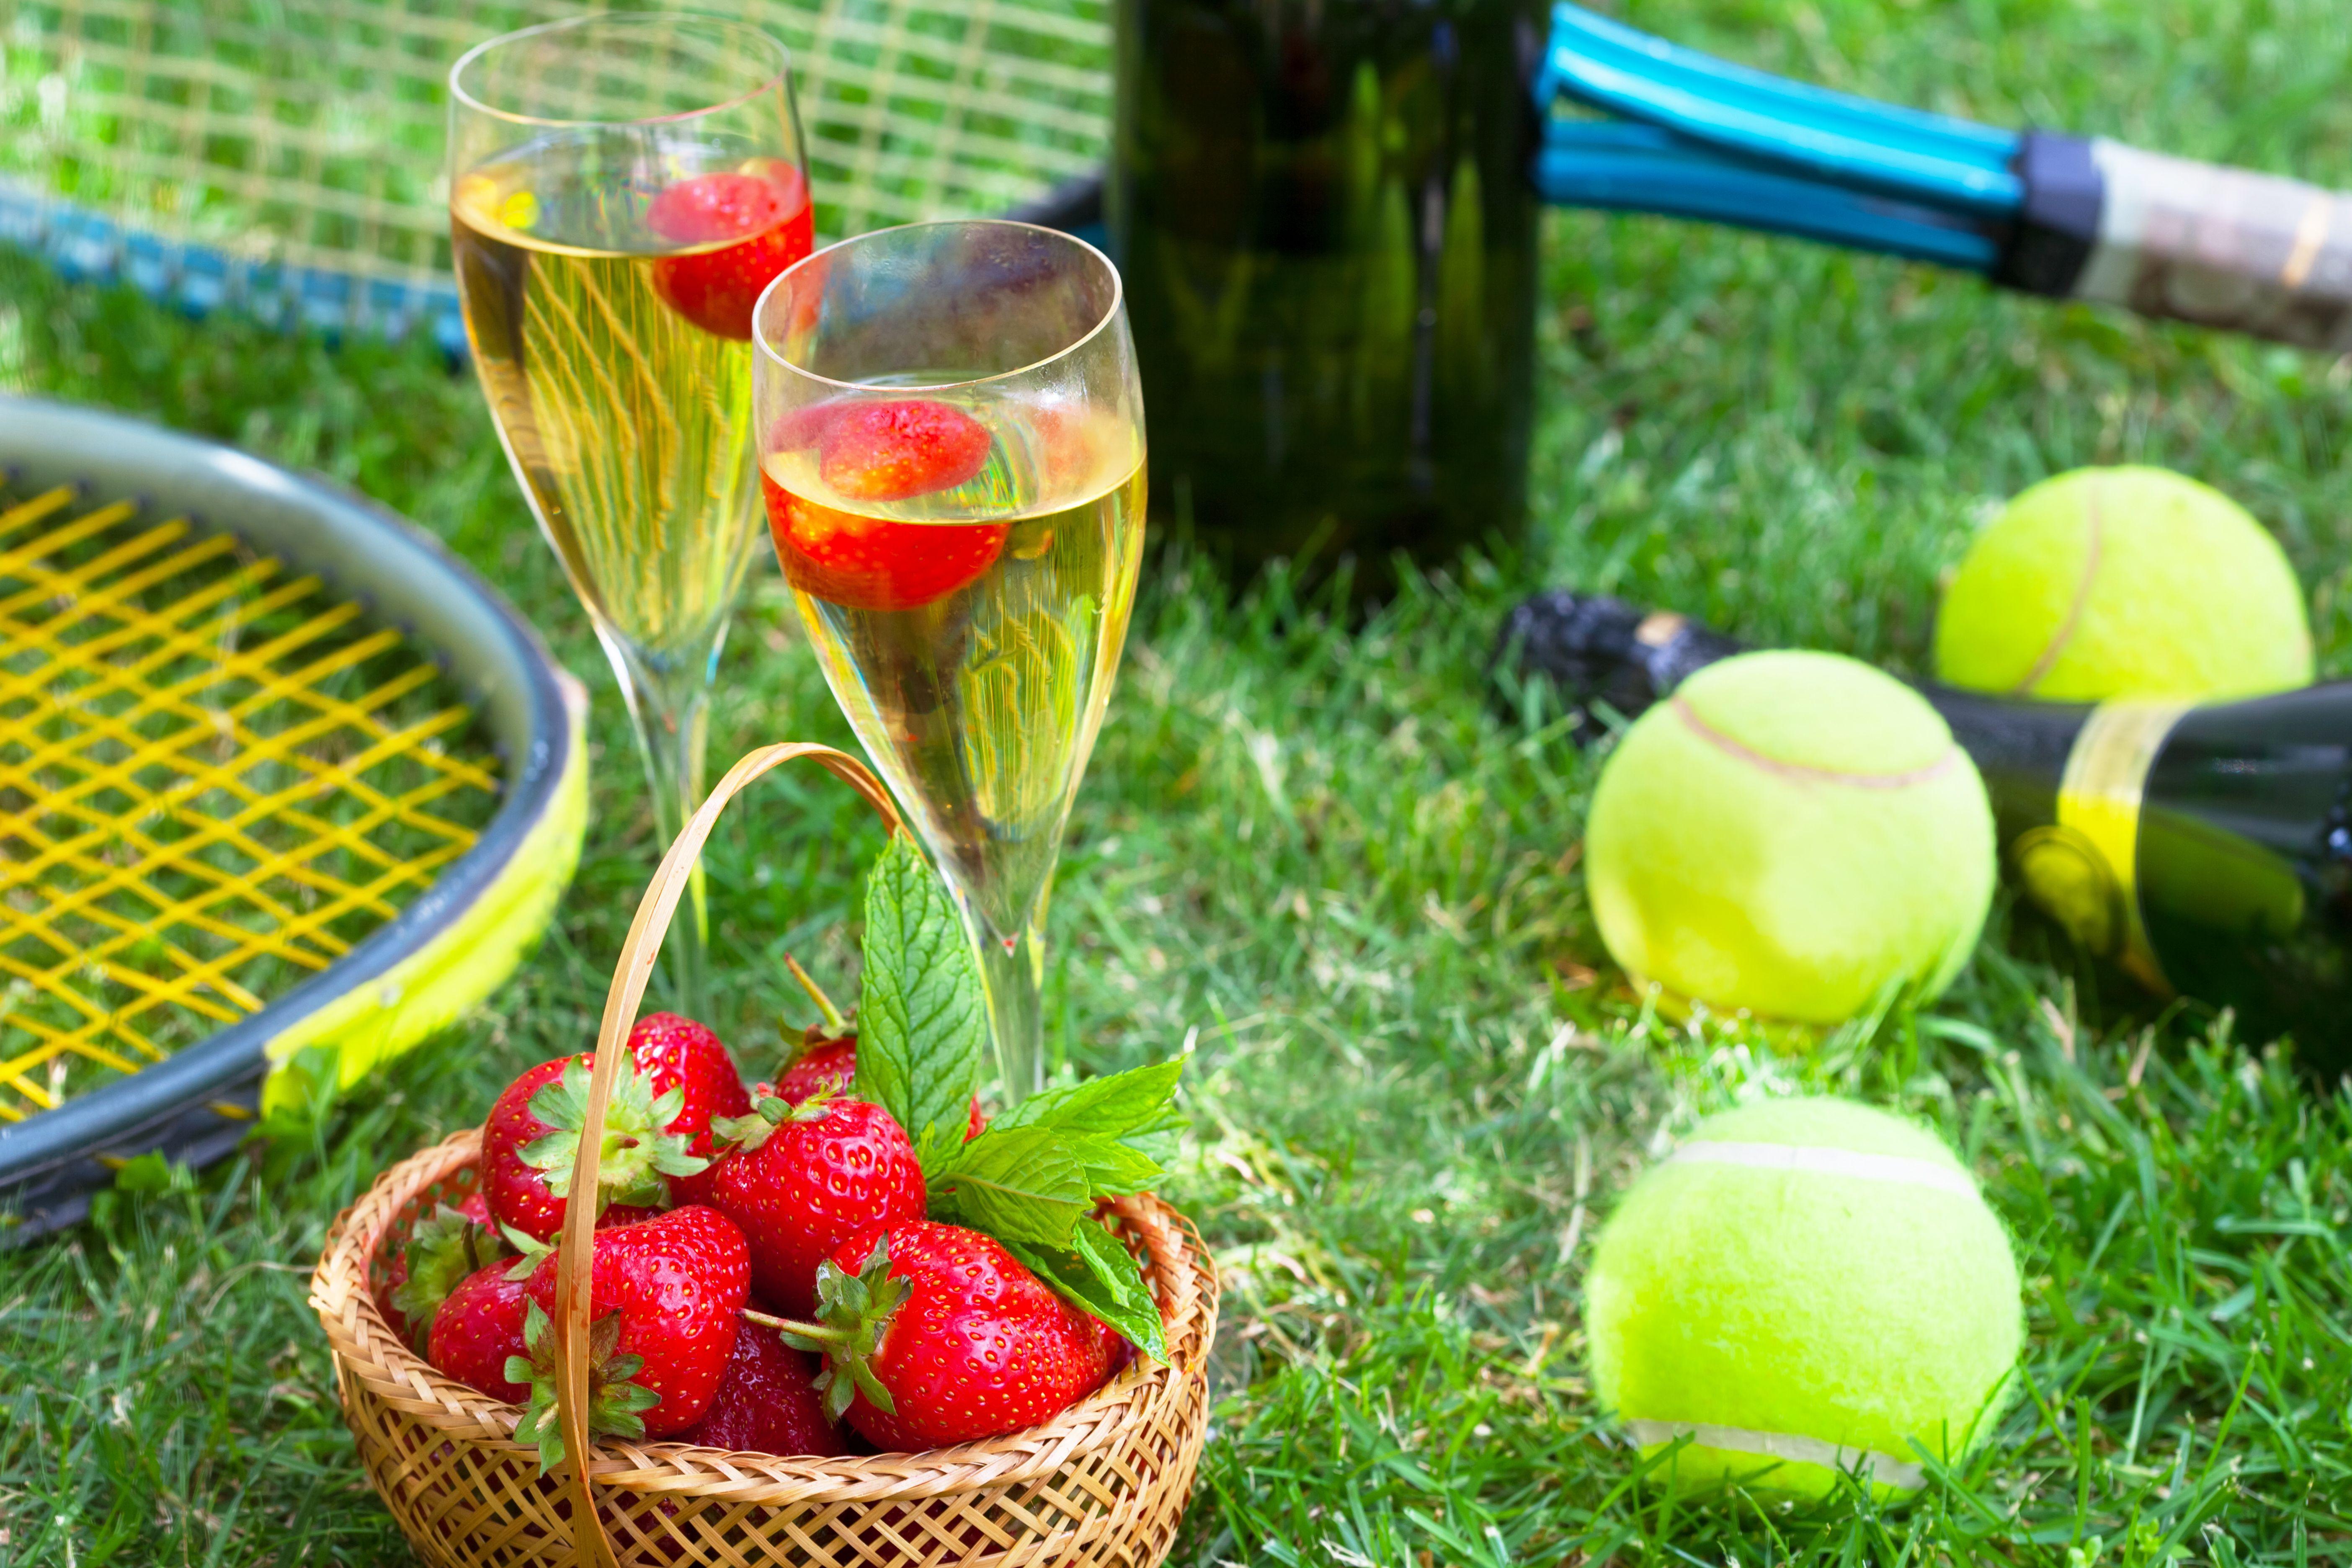 Tennis and strawberries_shutterstock_431058601